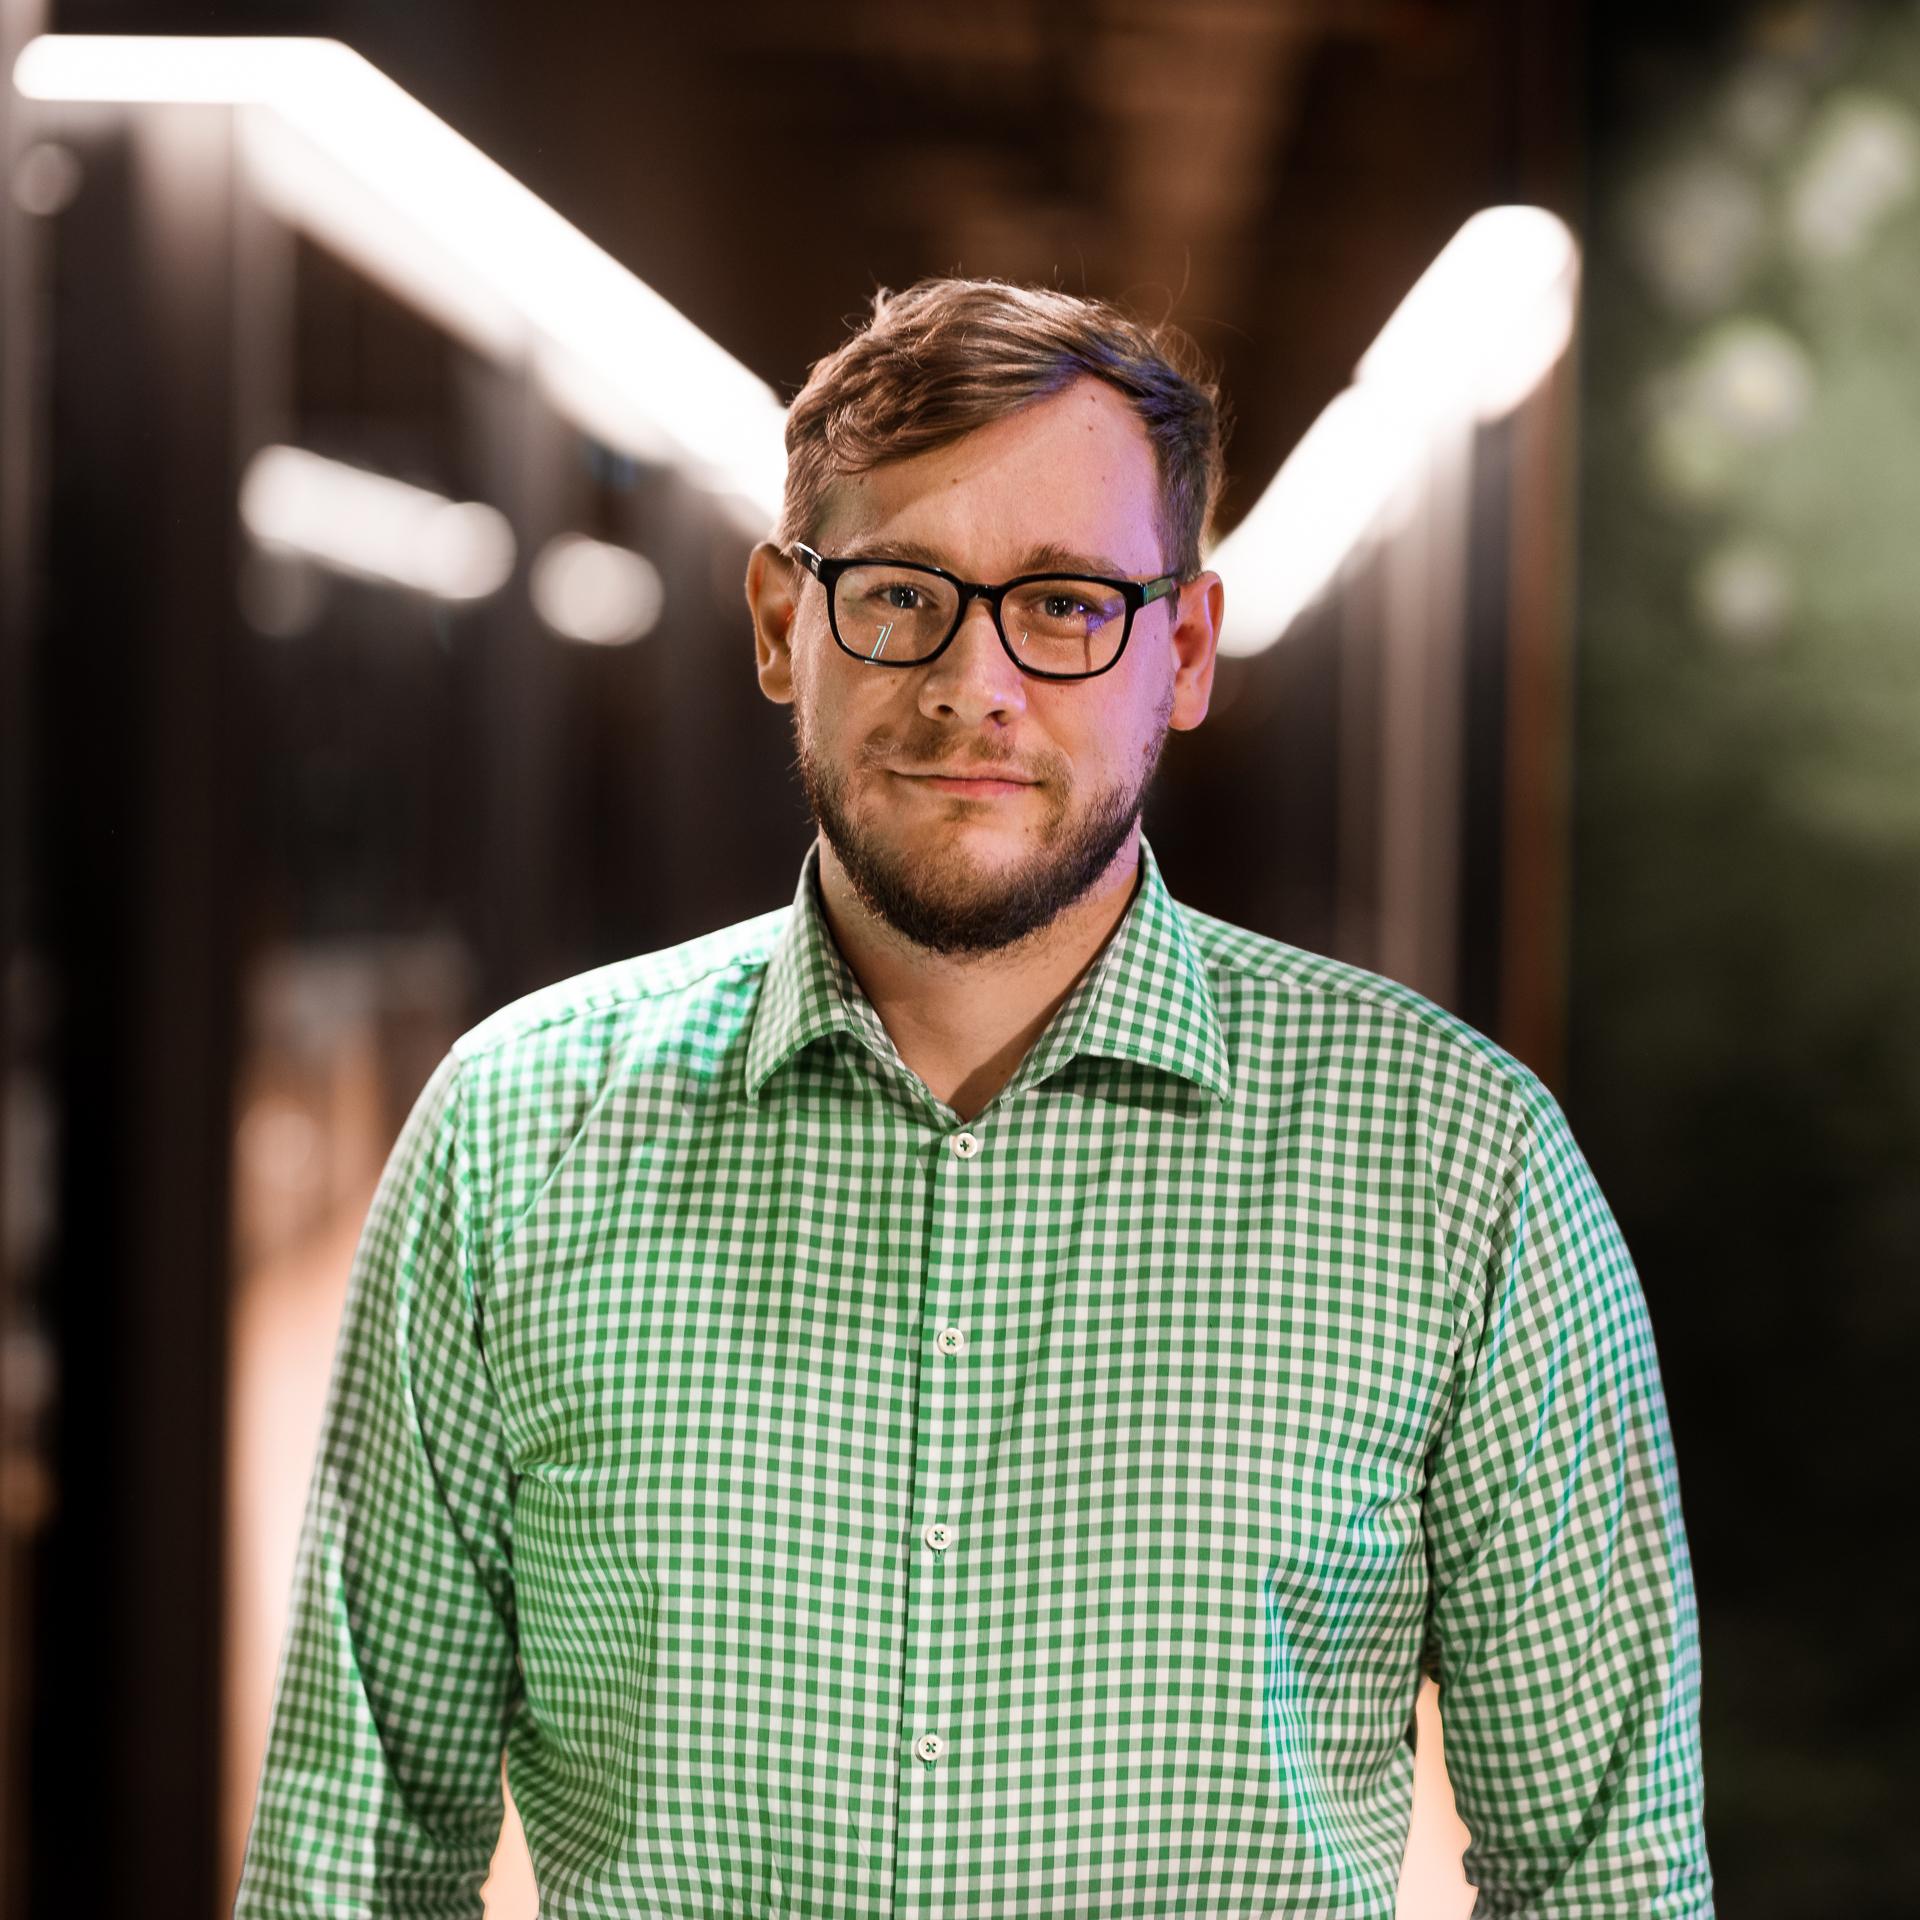 Jakub Buszynski   Head of Hardware   LinkedIN